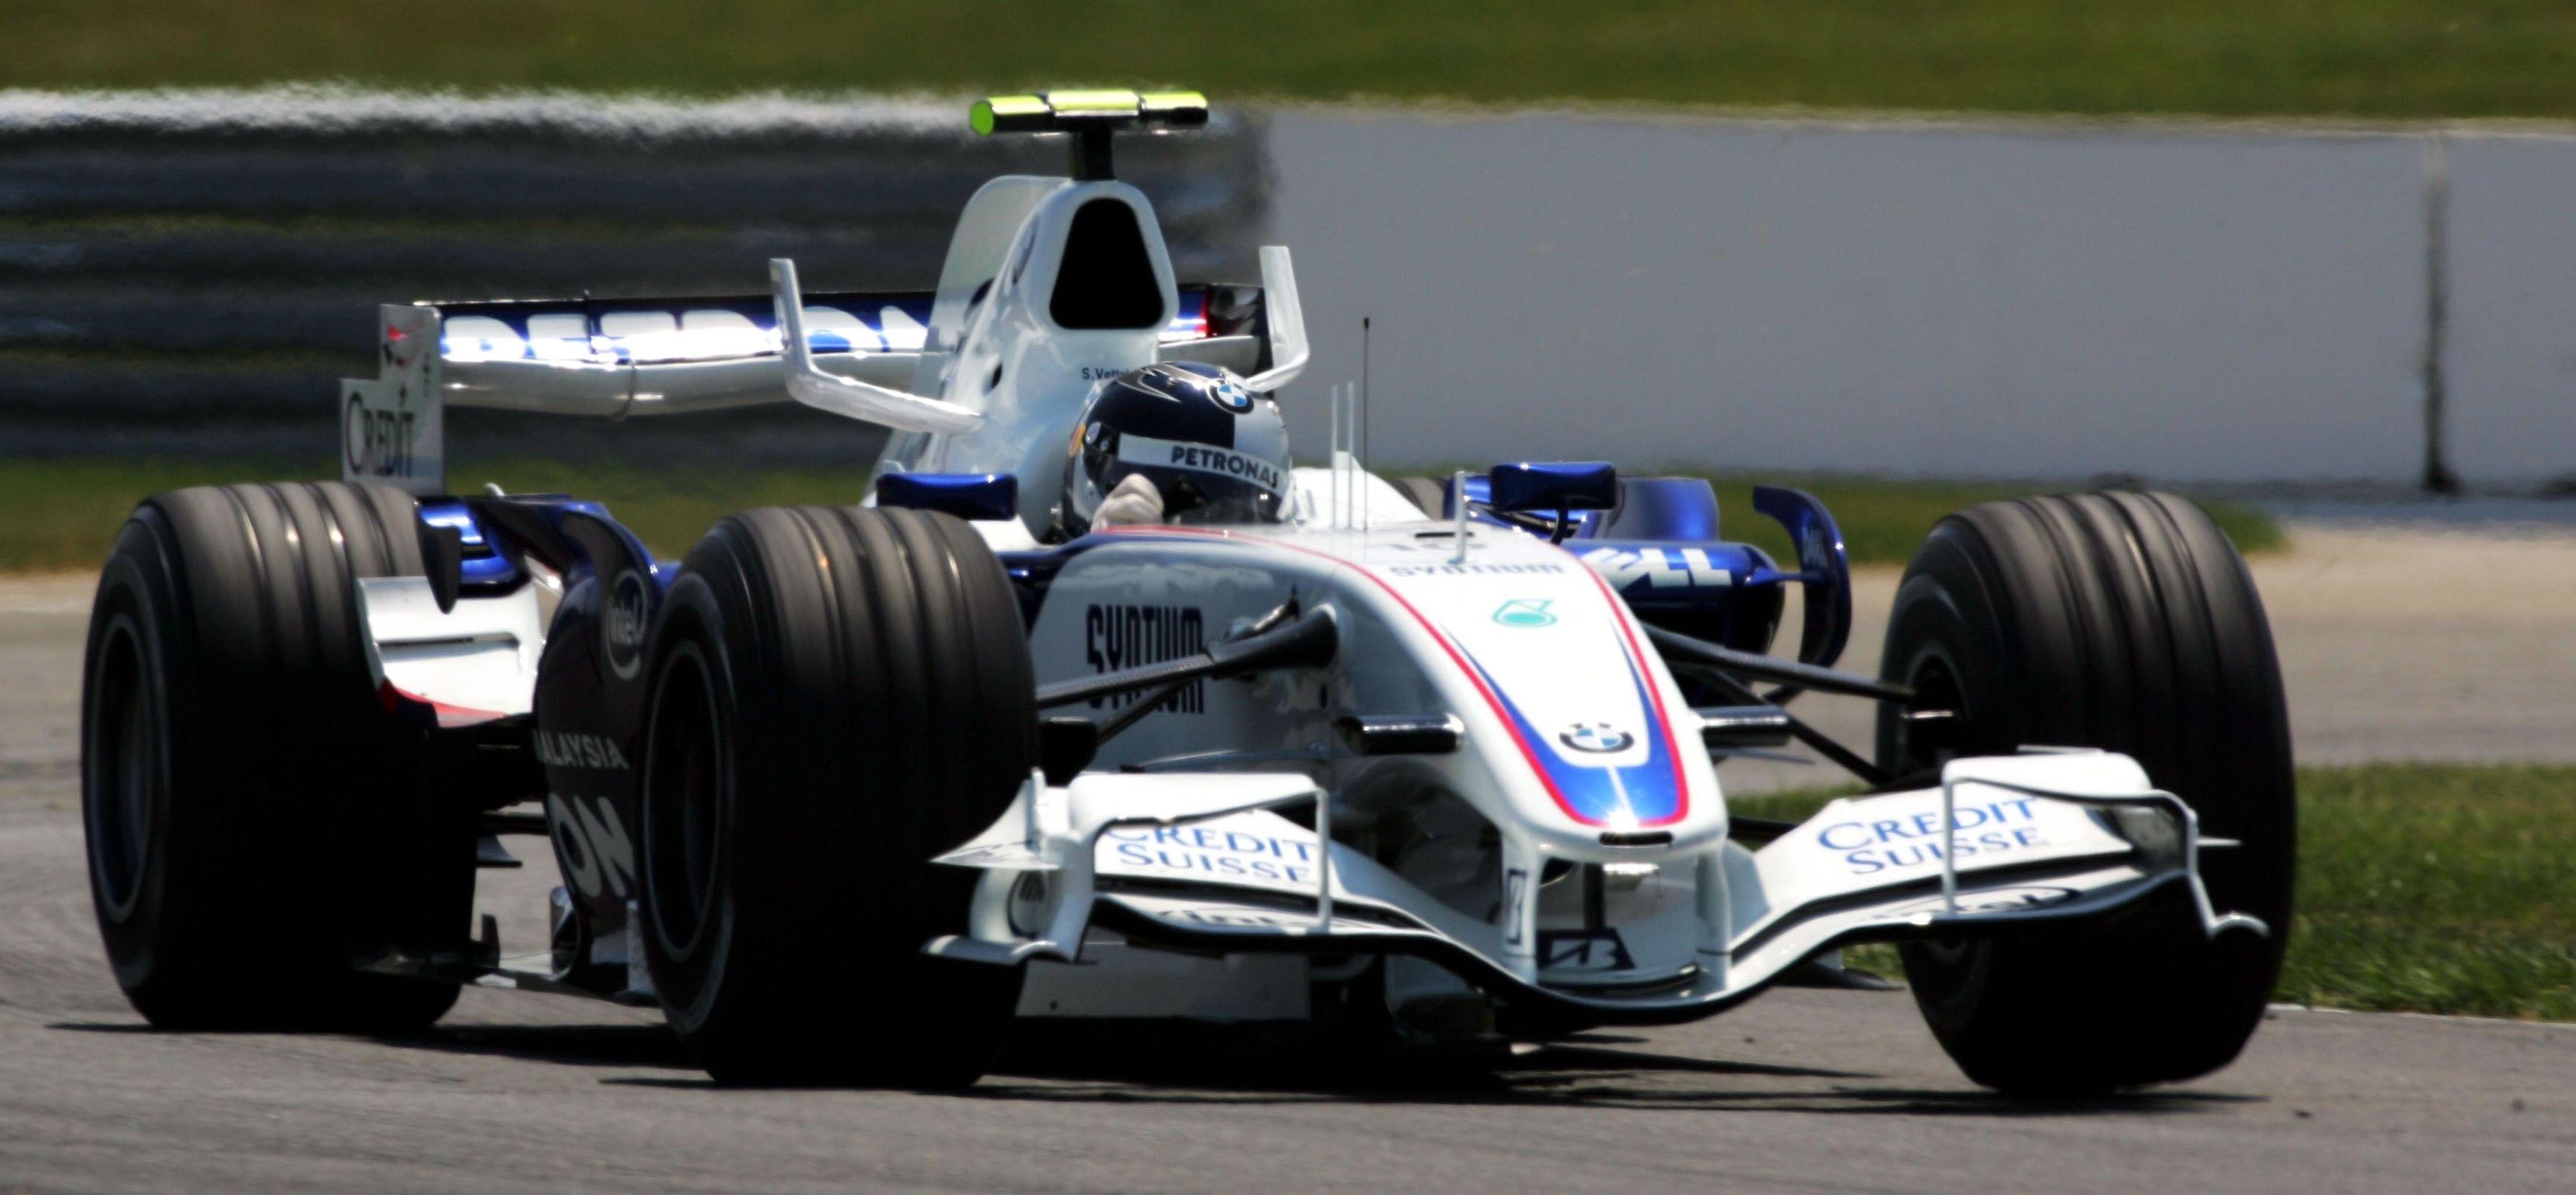 F1's mid-season driver swaps: Part 2